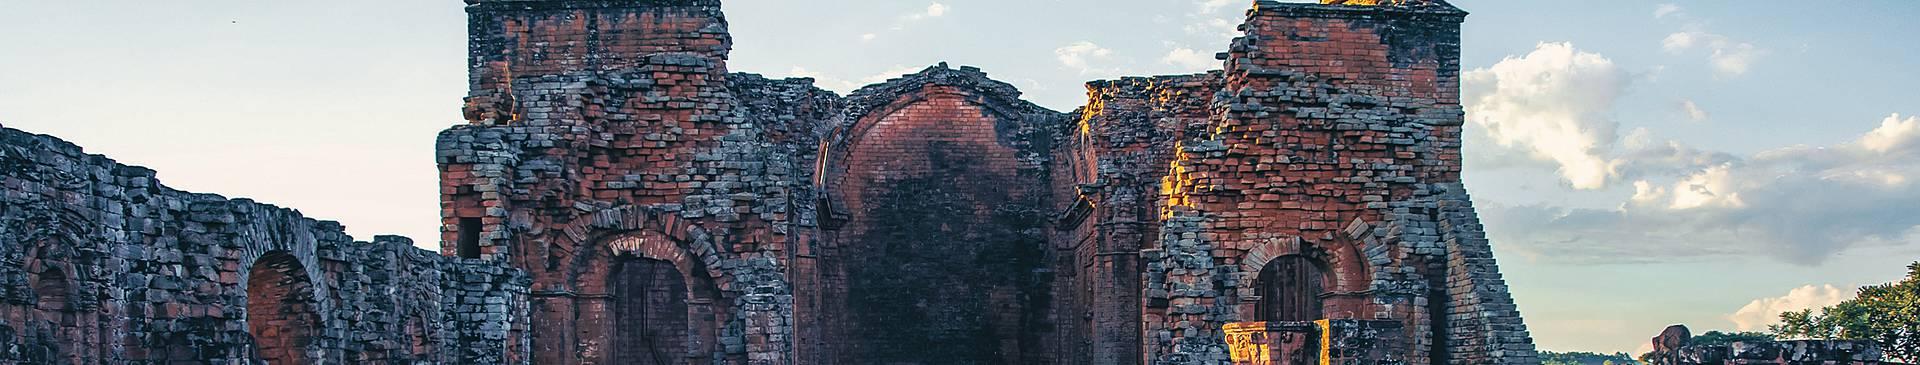 Historical sites in Uruguay